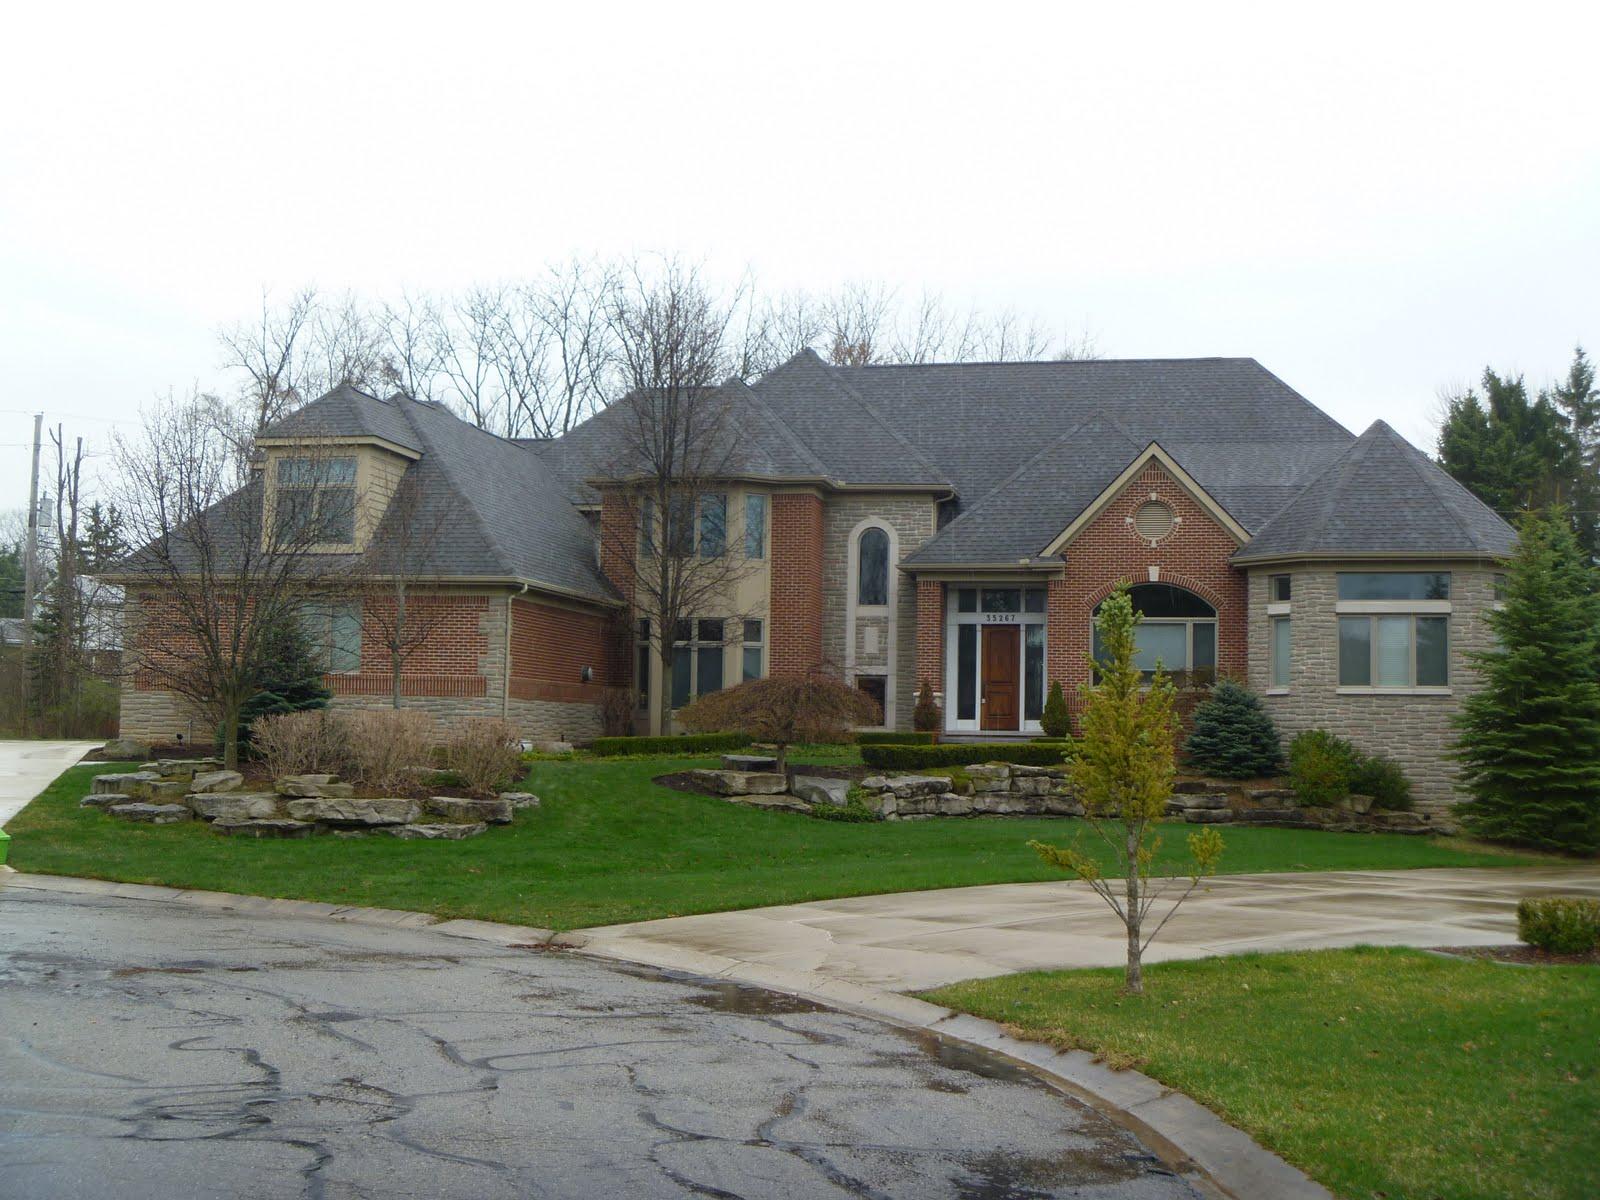 Homes for sale in farmington hills mi blog subdivision for House builders in michigan